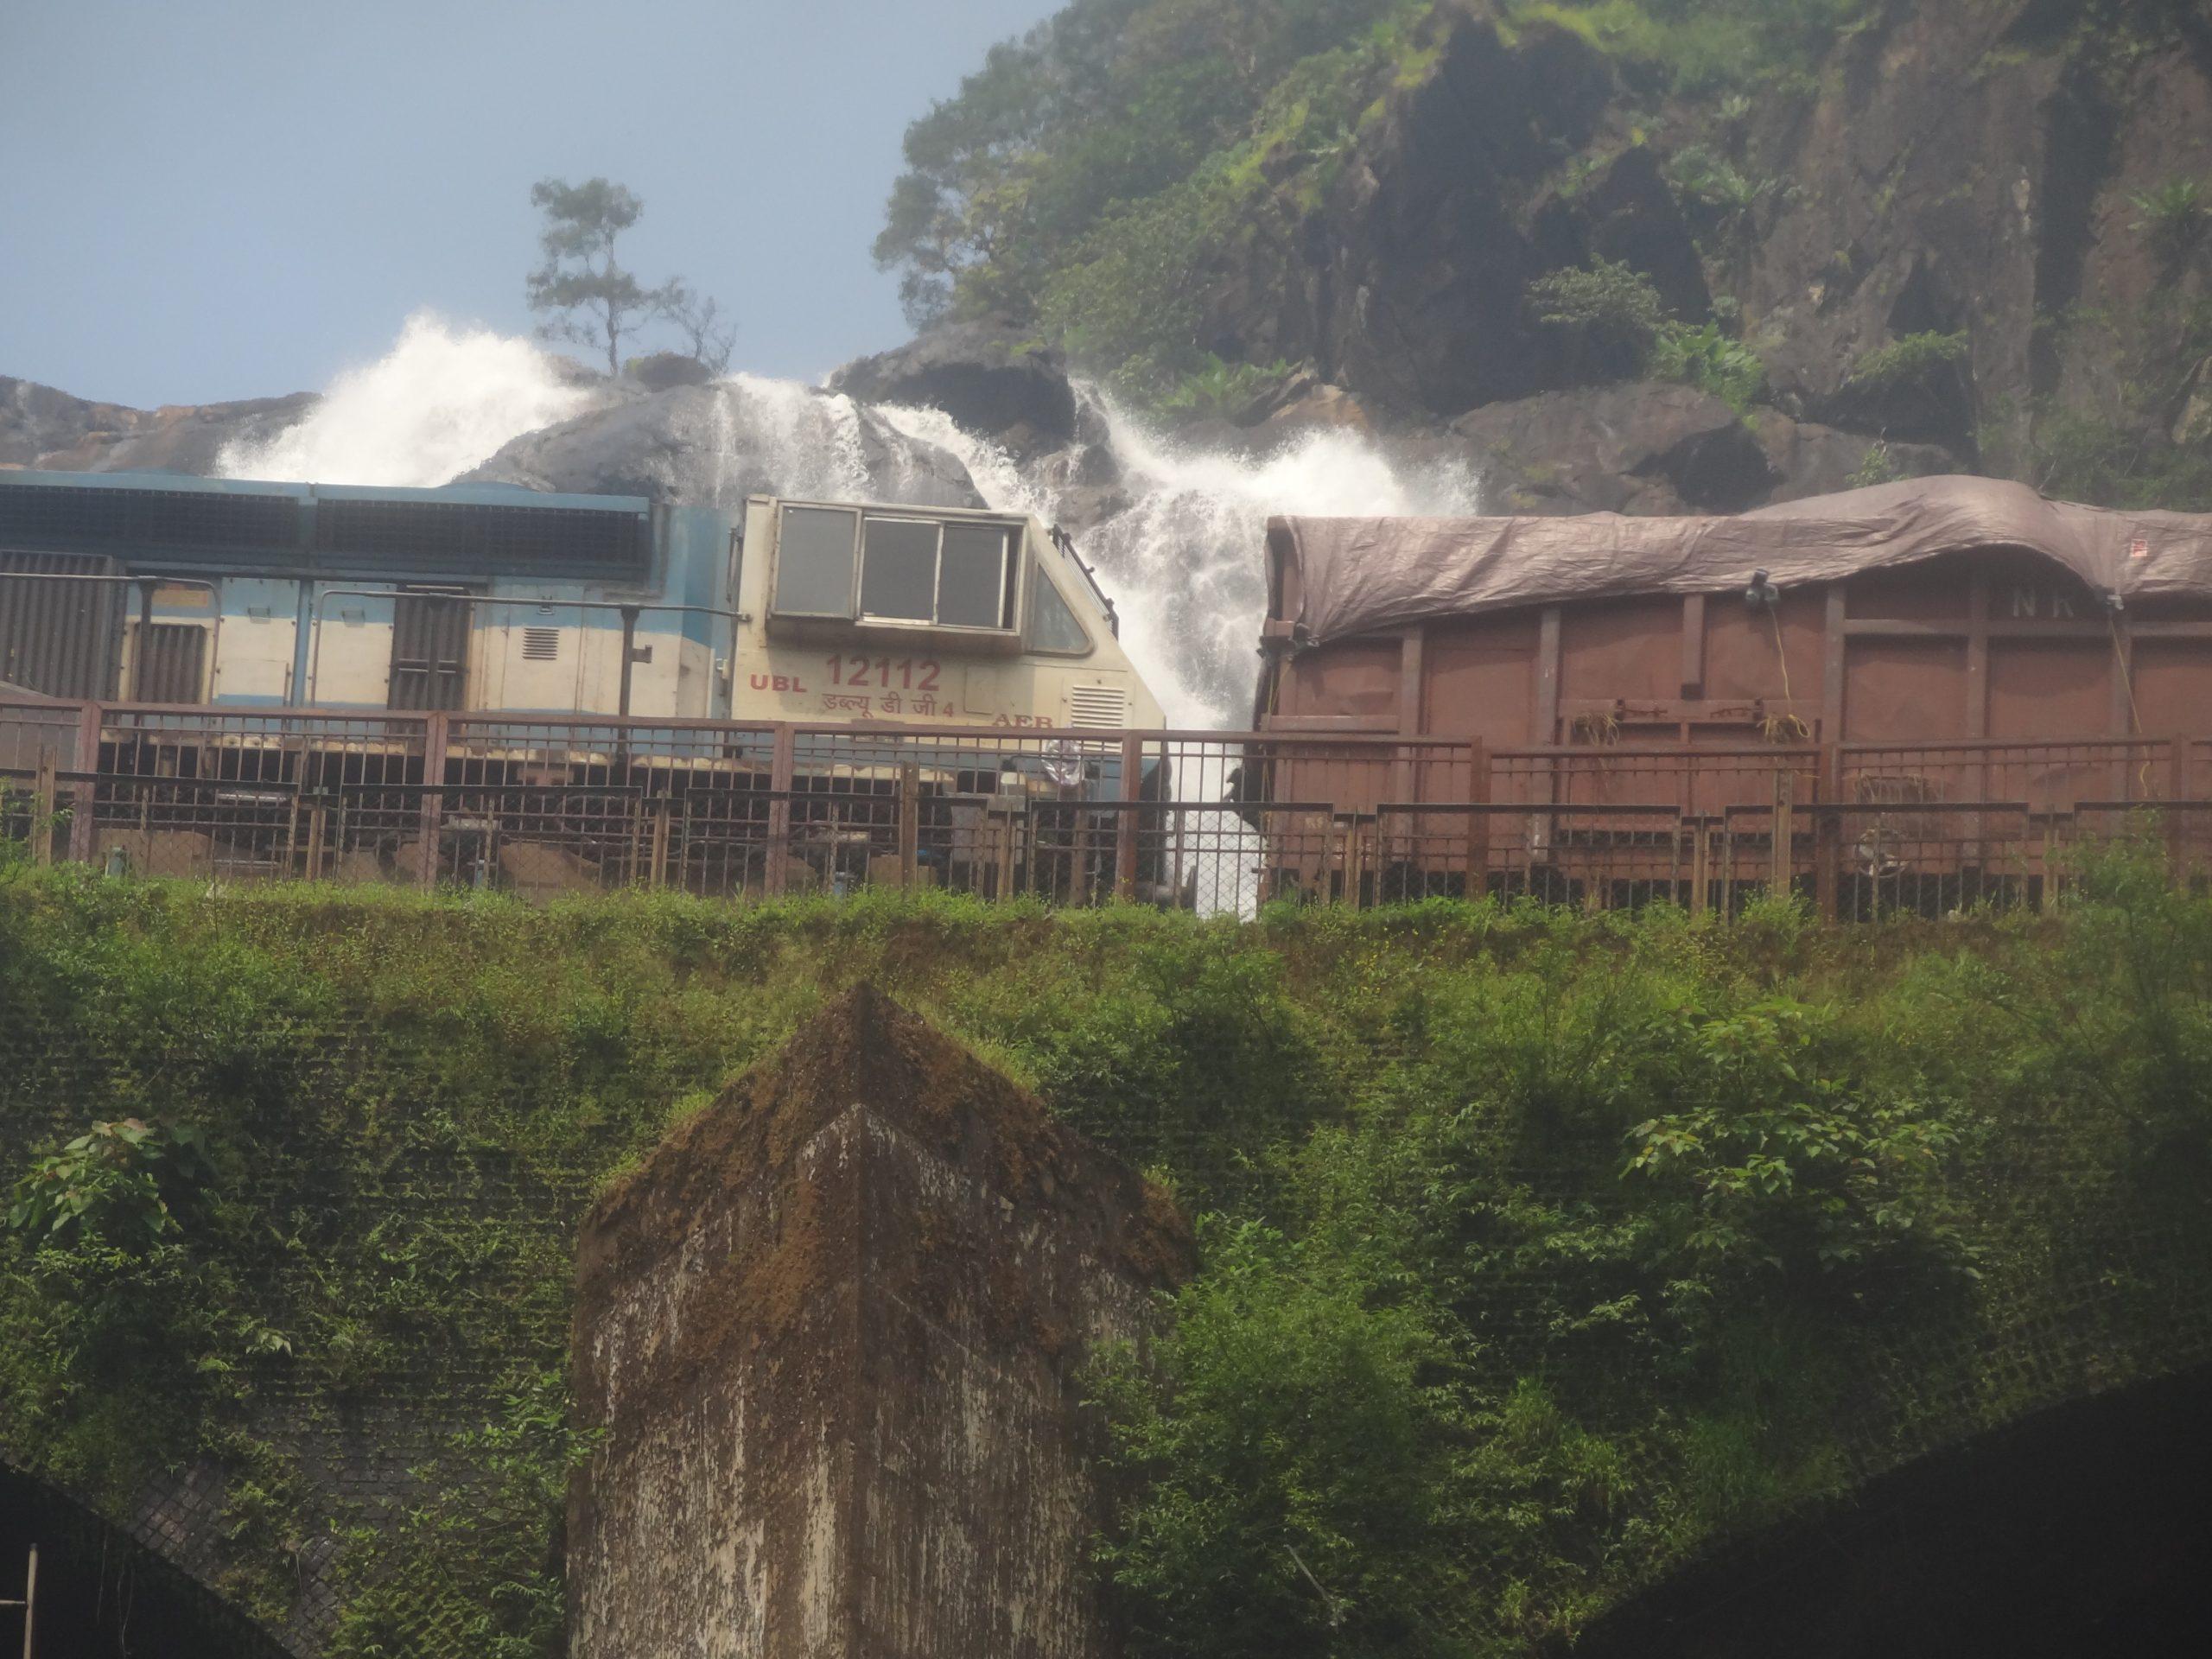 Doodhsagar waterfalls in Goa